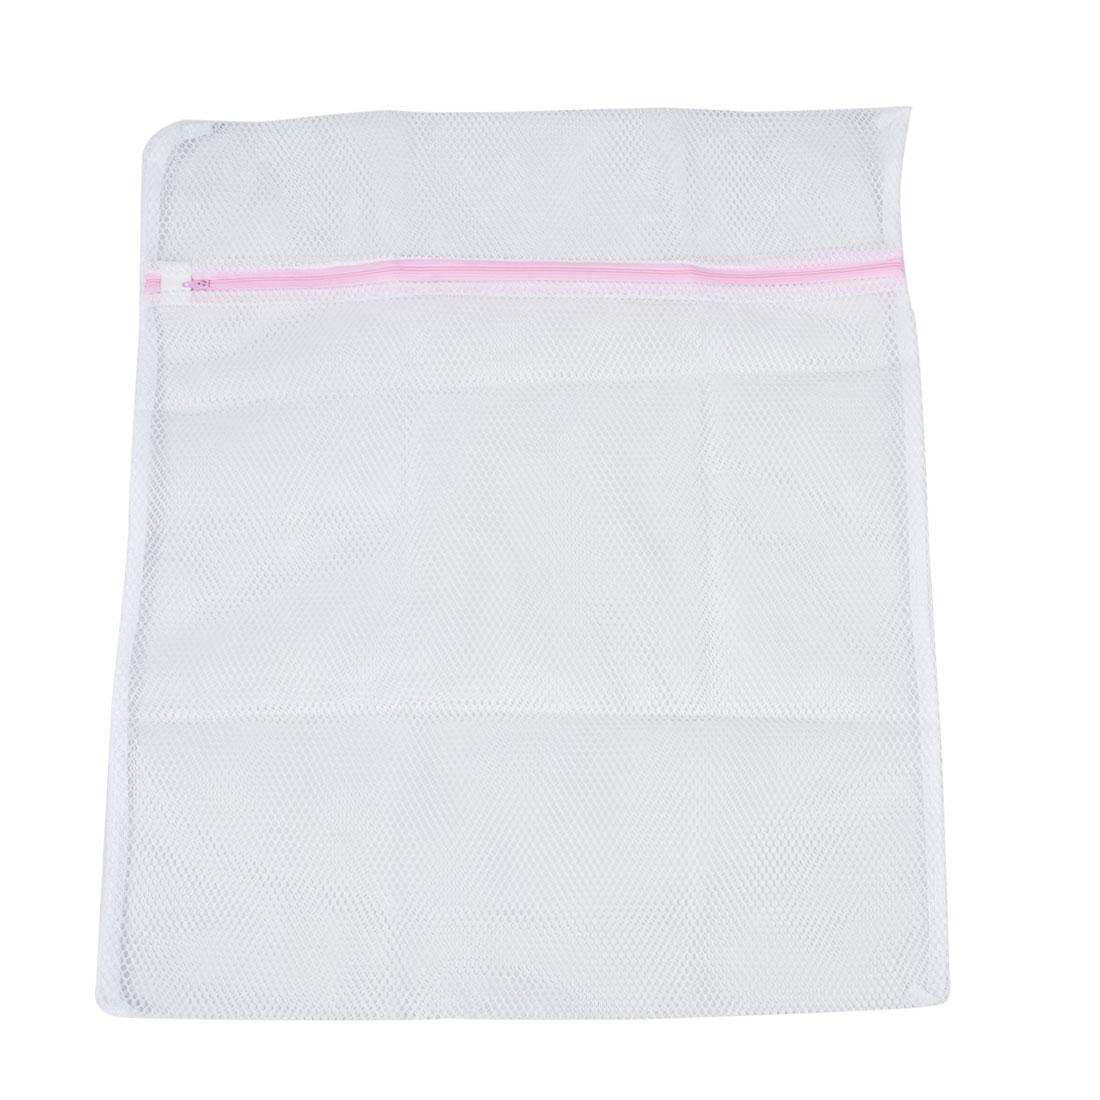 Laundry White Meshy Underwear Silk Stockings Clothes Washing Bag 50cm x 40cm